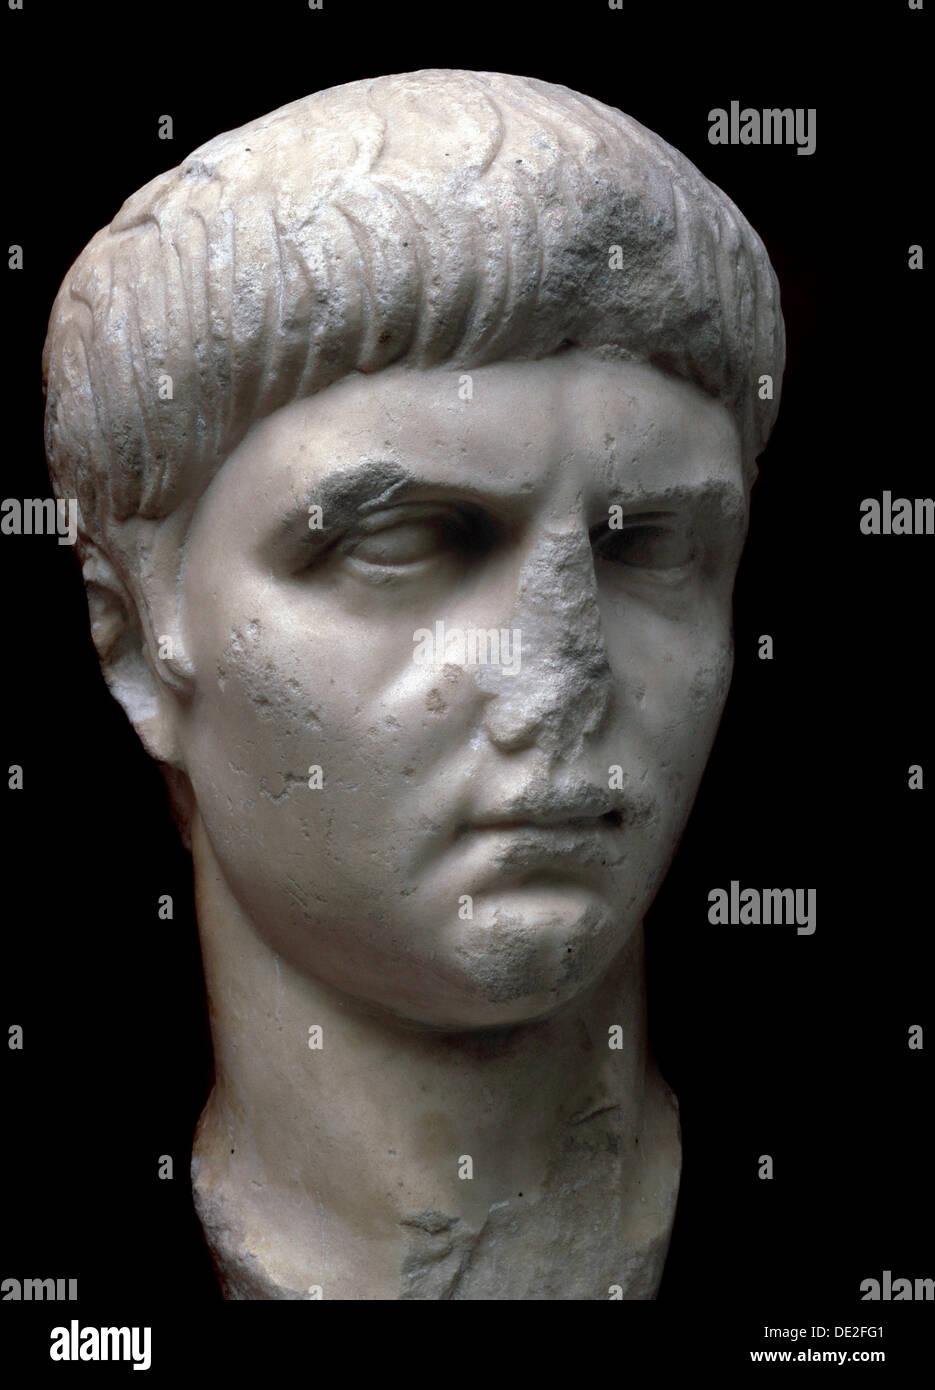 Marble portrait bust of the Roman Emperor Nero, 1st century. - Stock Image